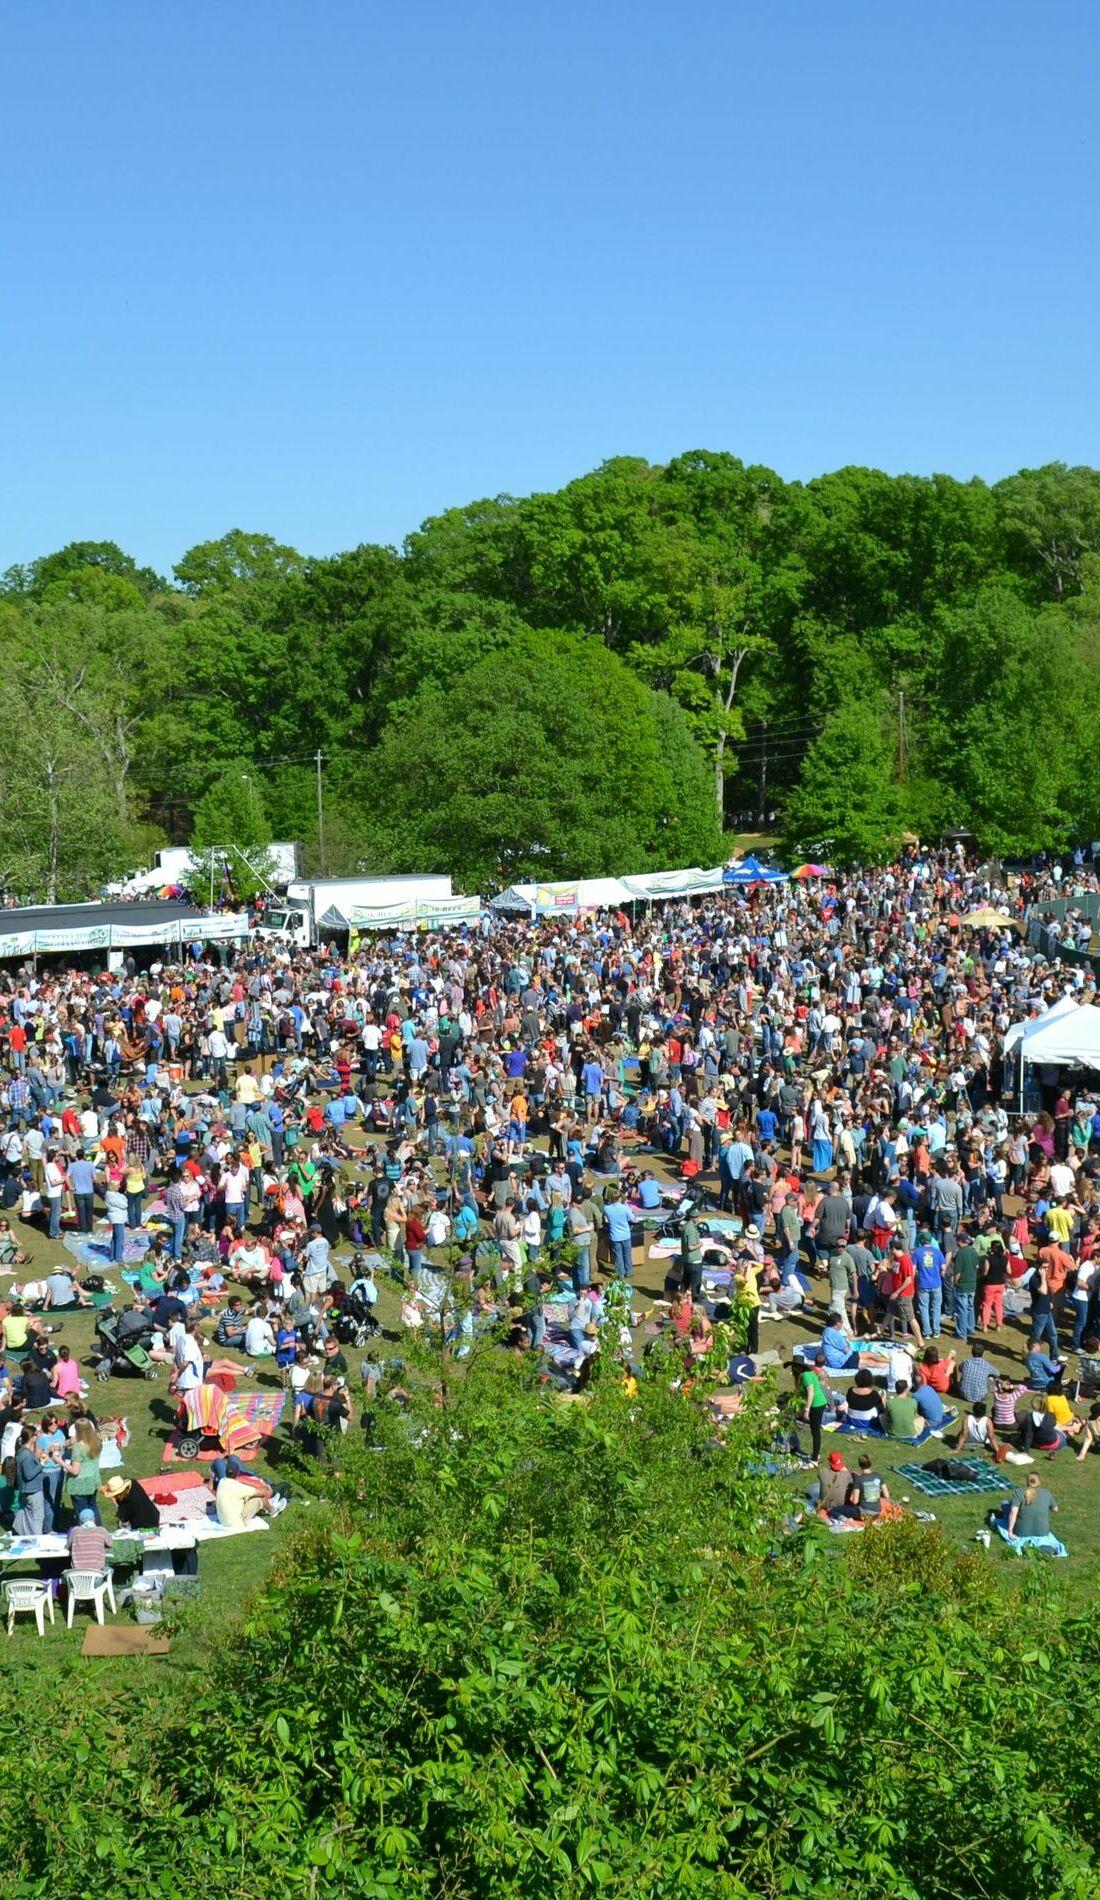 A 420 Fest live event